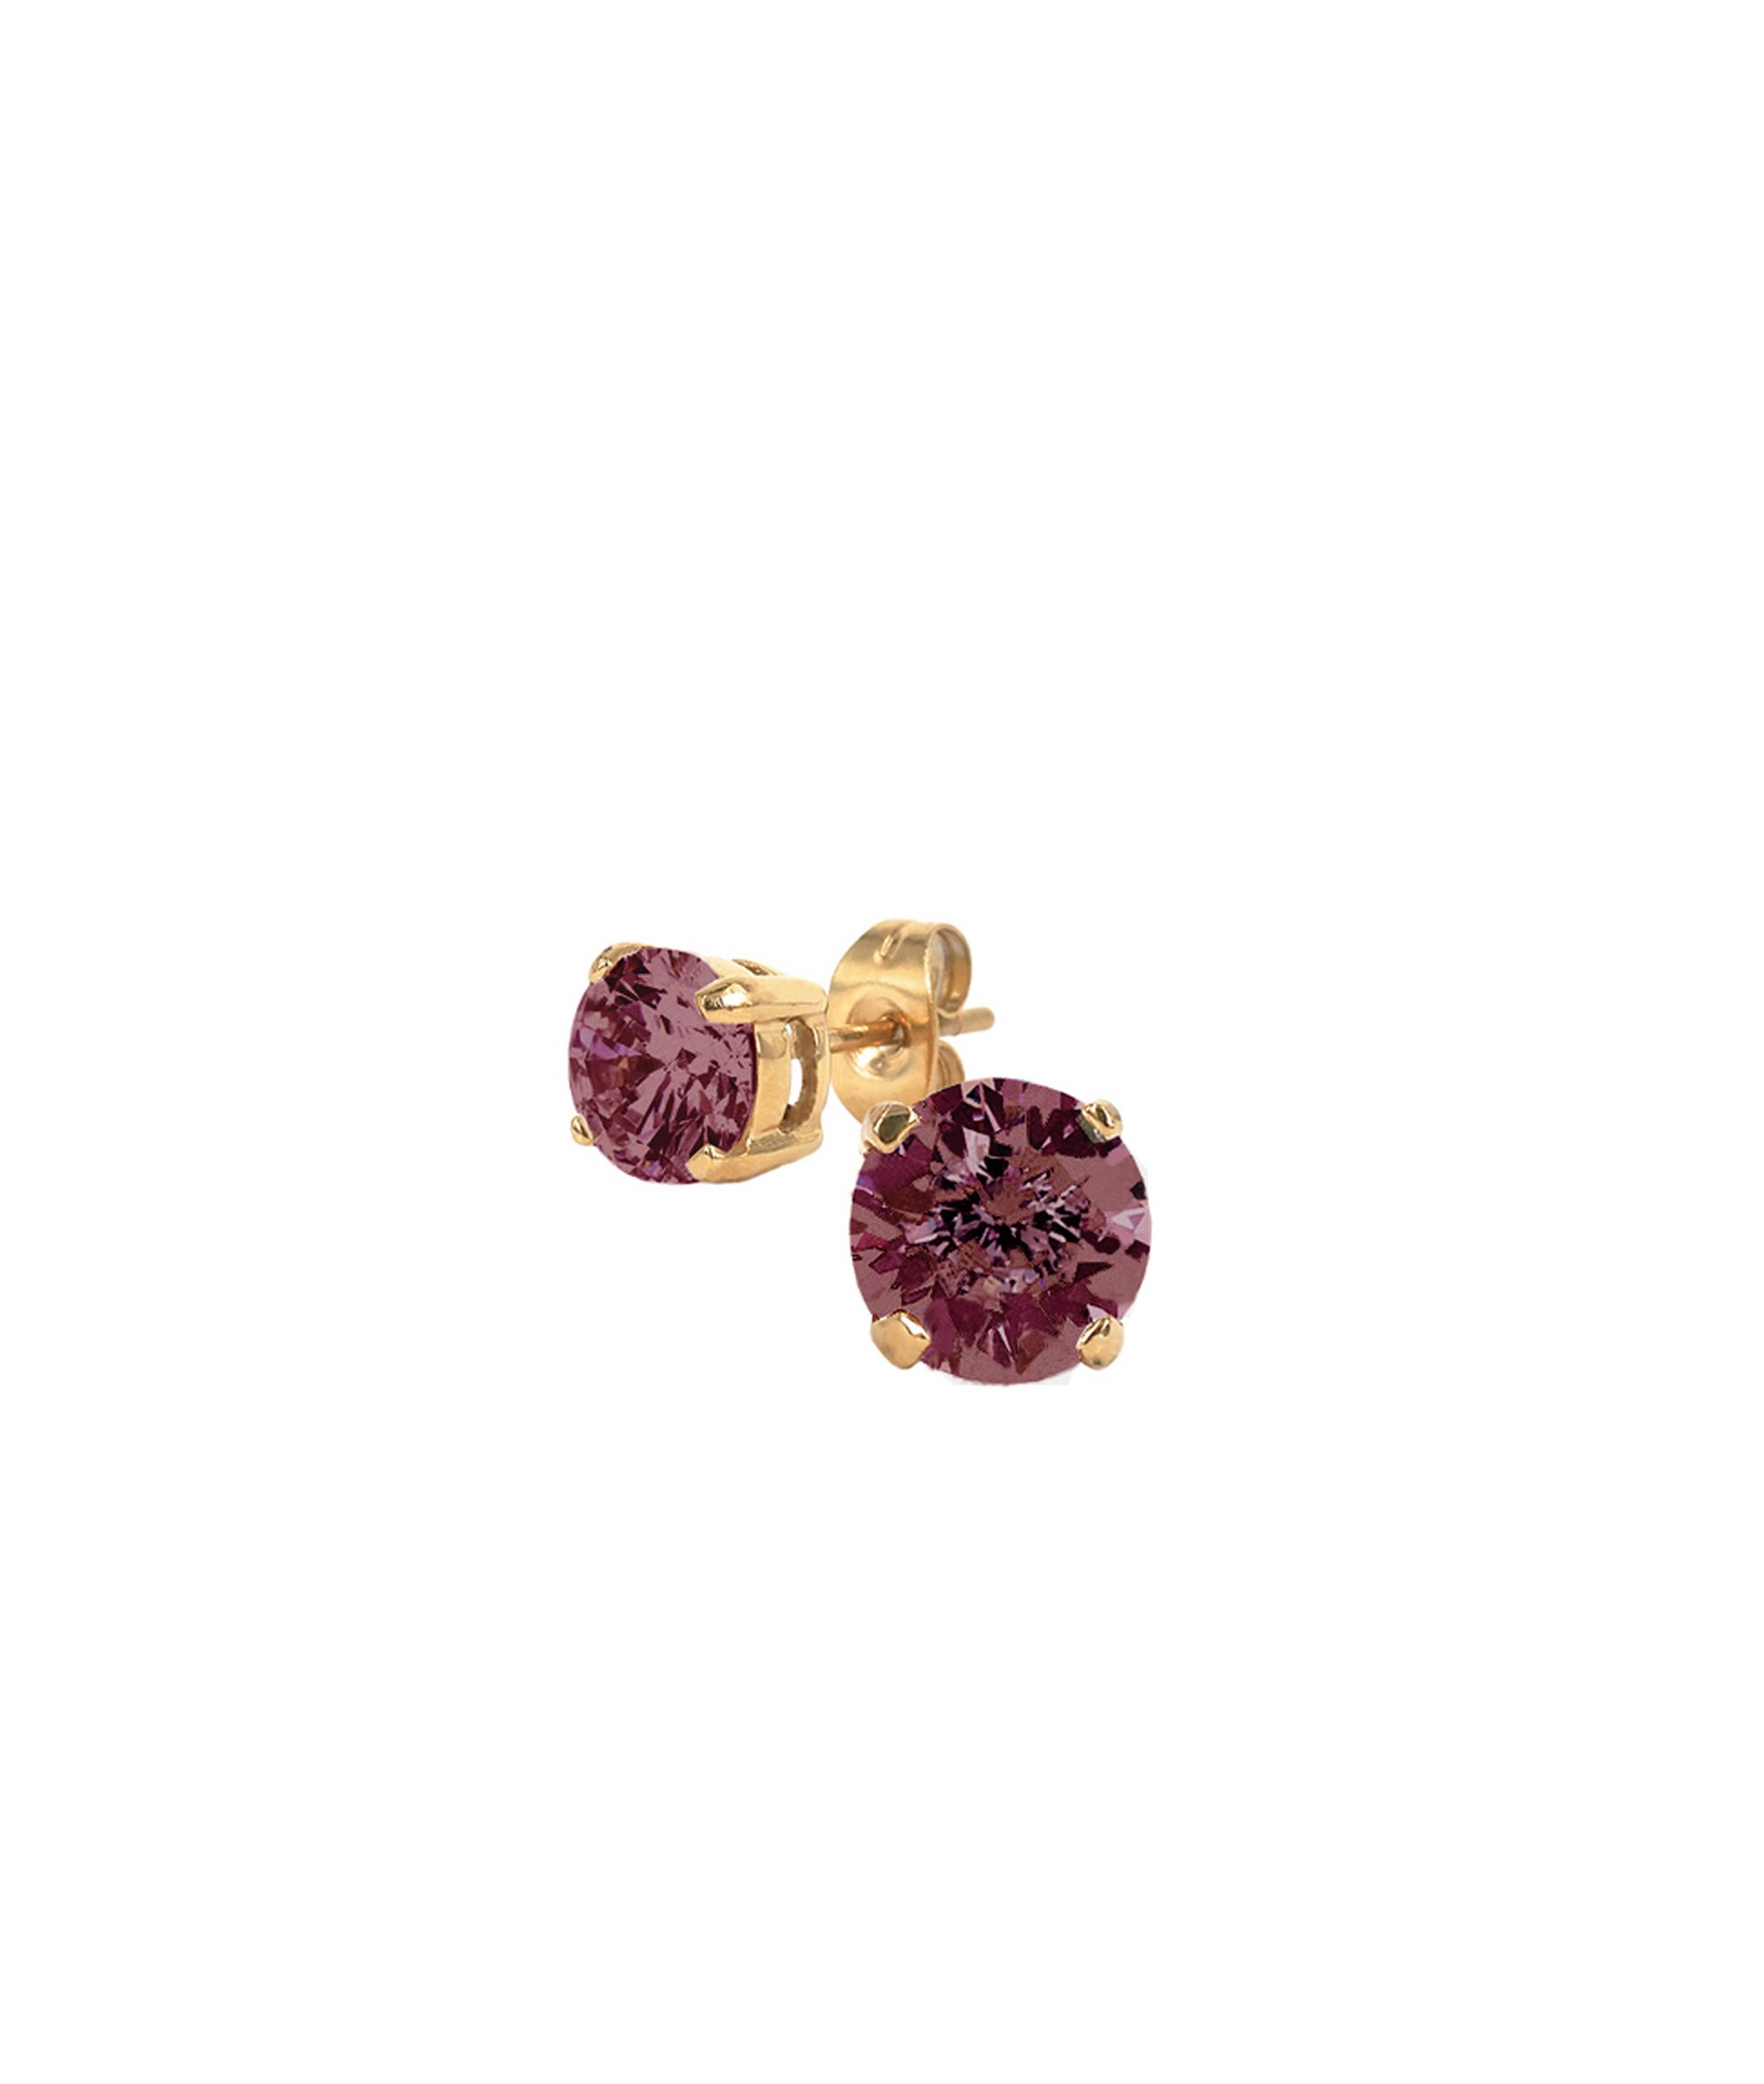 IDA-Orh-Guld-Plom-4-mmNY